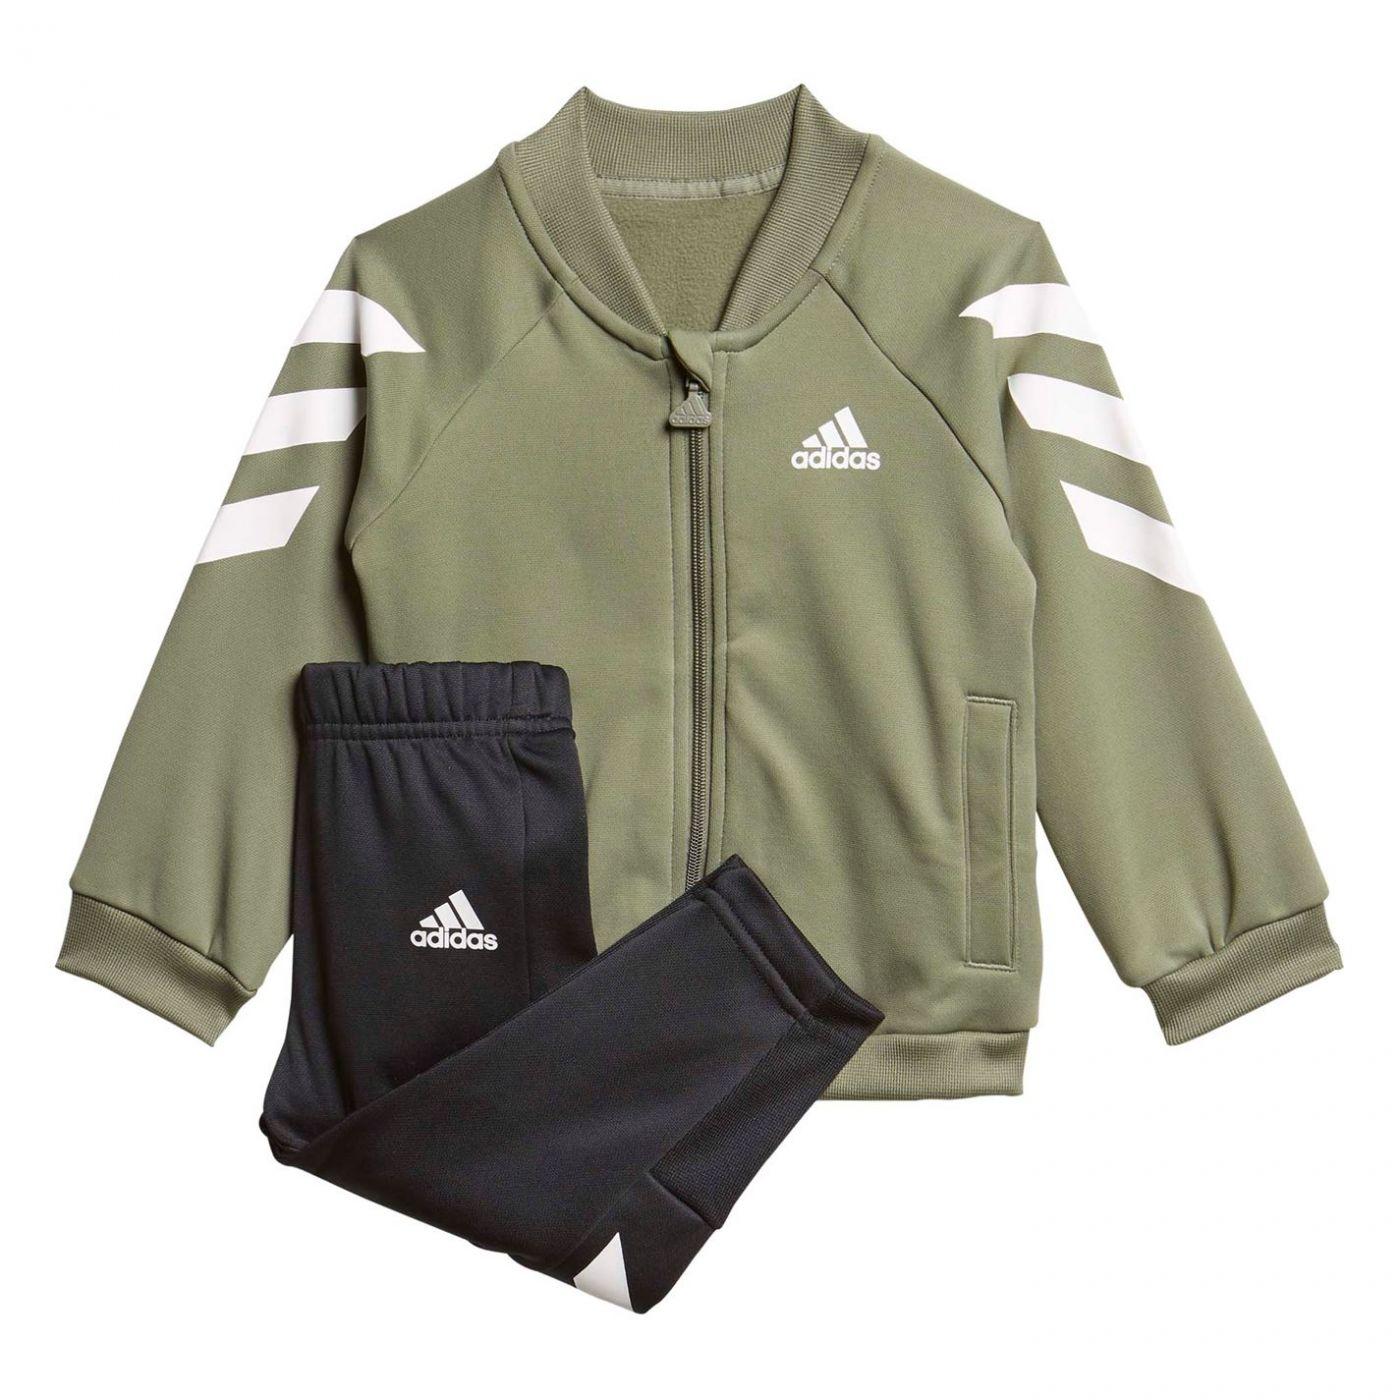 Adidas FZ JogSetInB02